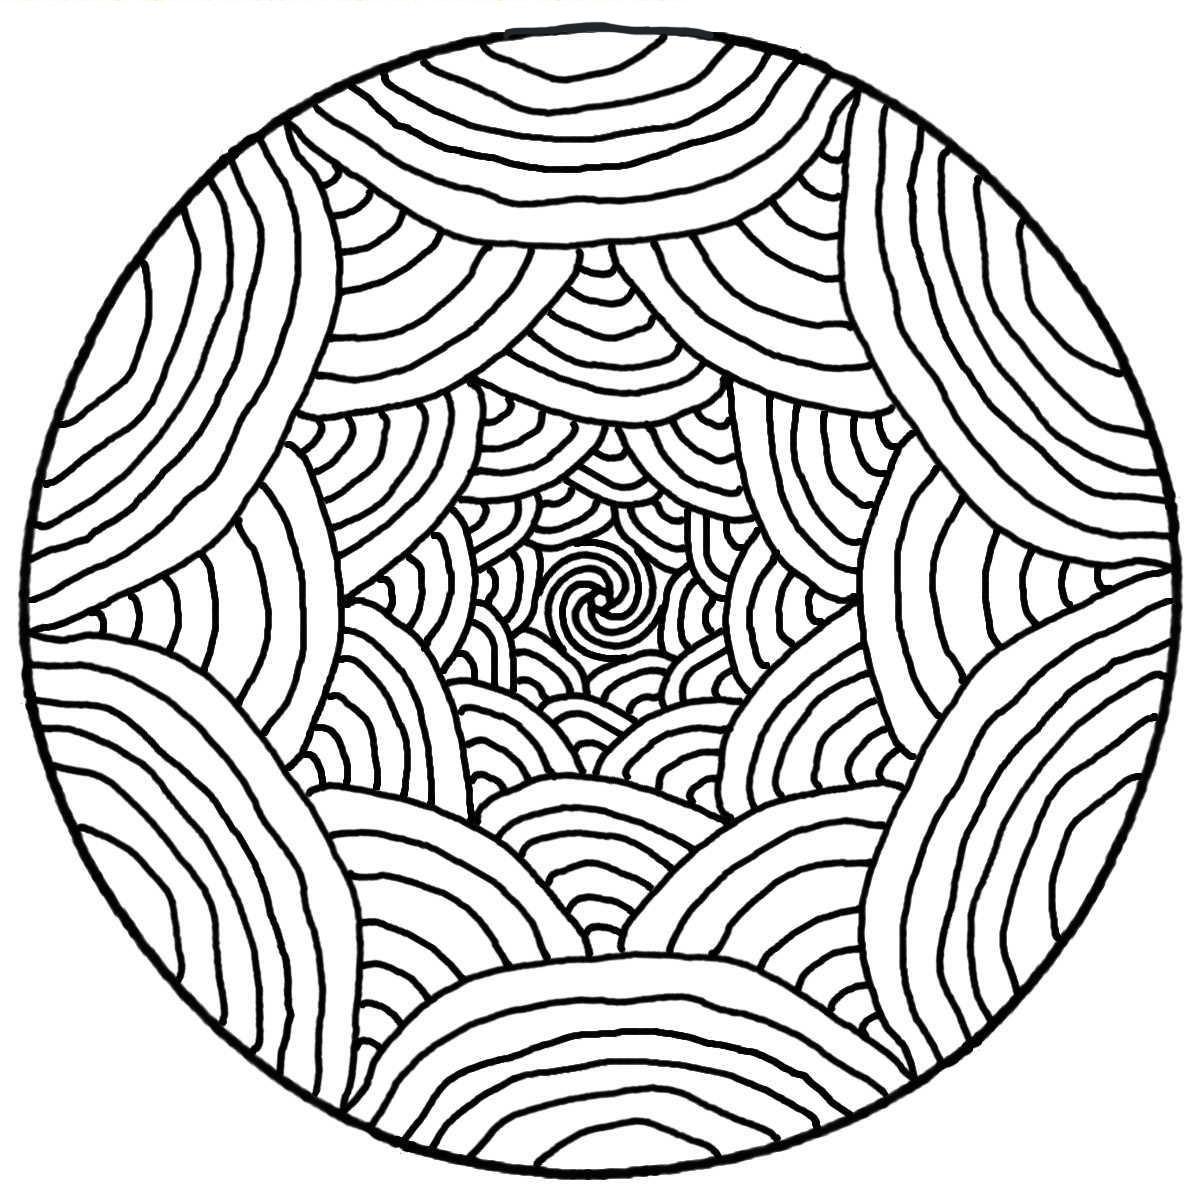 Mandala - M&alas Adult Coloring Pages - Page 6